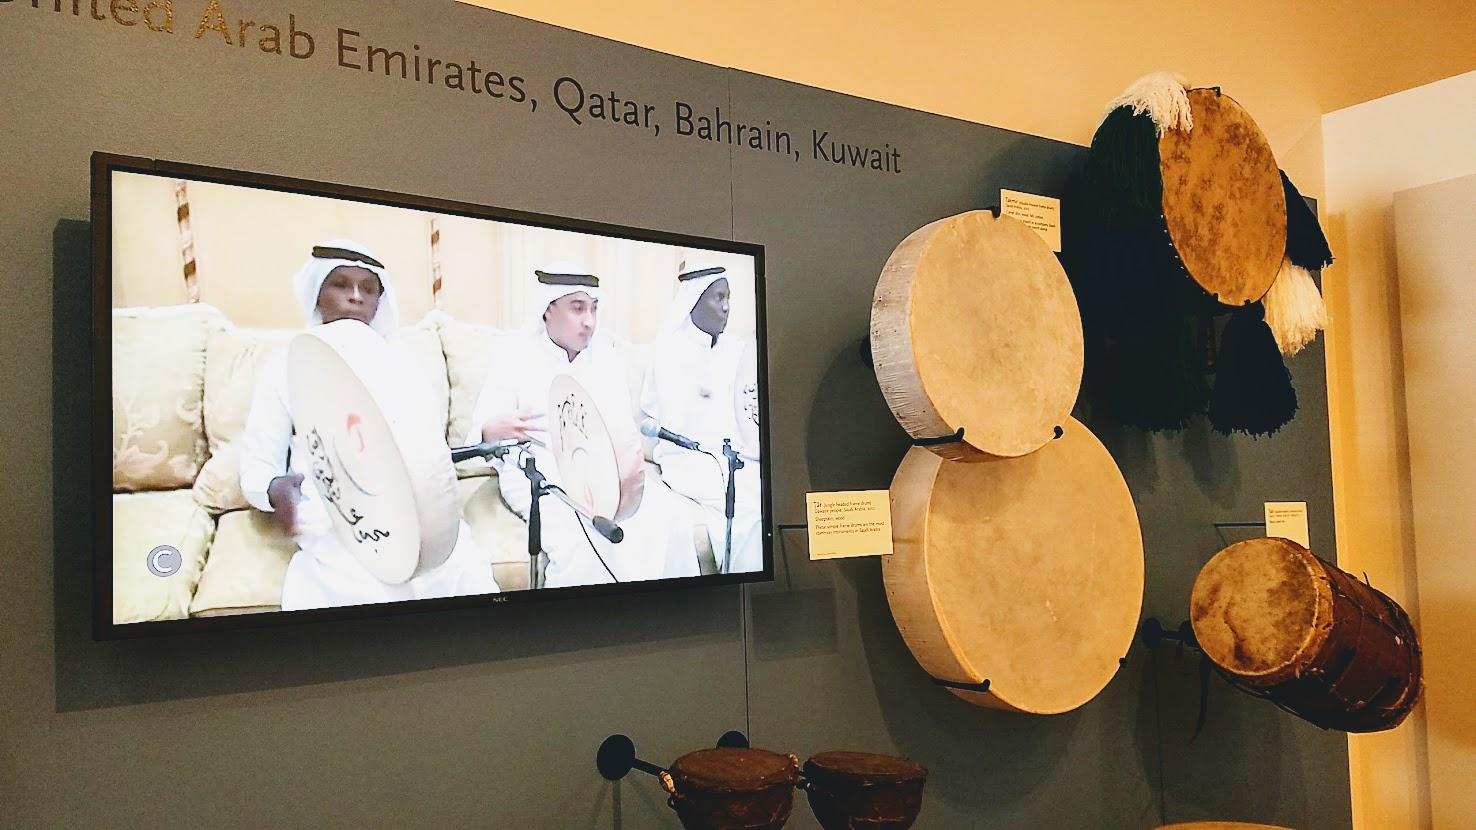 Music Instrument Museum (MIM) Geographic galleries, music instruments of United Arab Emirates, Qatar, Bahrain, Kuwait